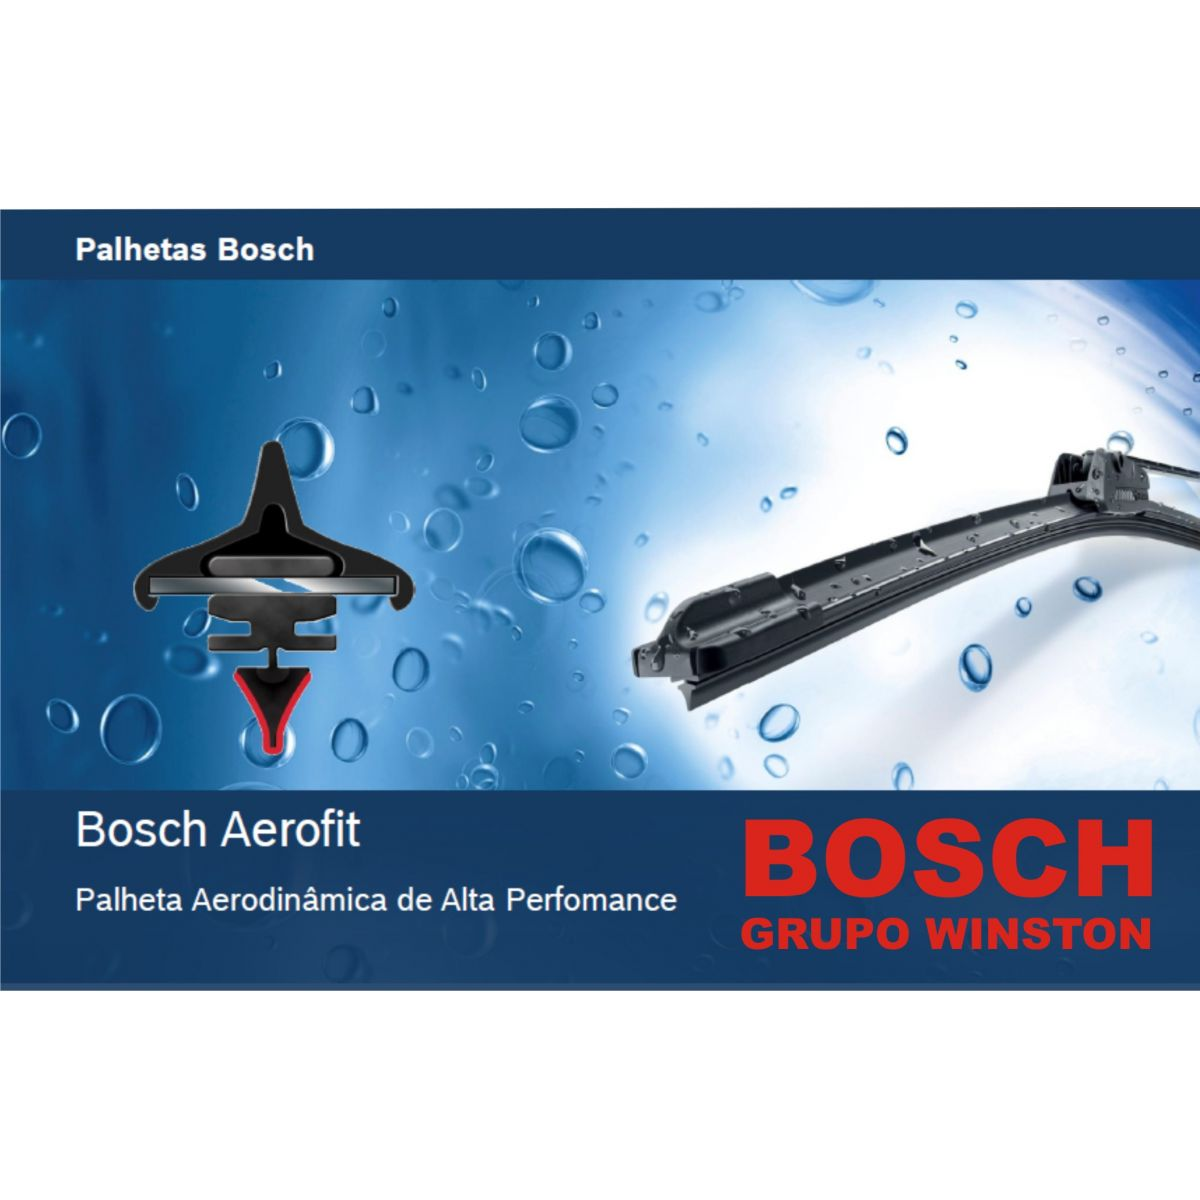 Palheta Bosch Aerofit Limpador de para brisa Bosch Topic Towner